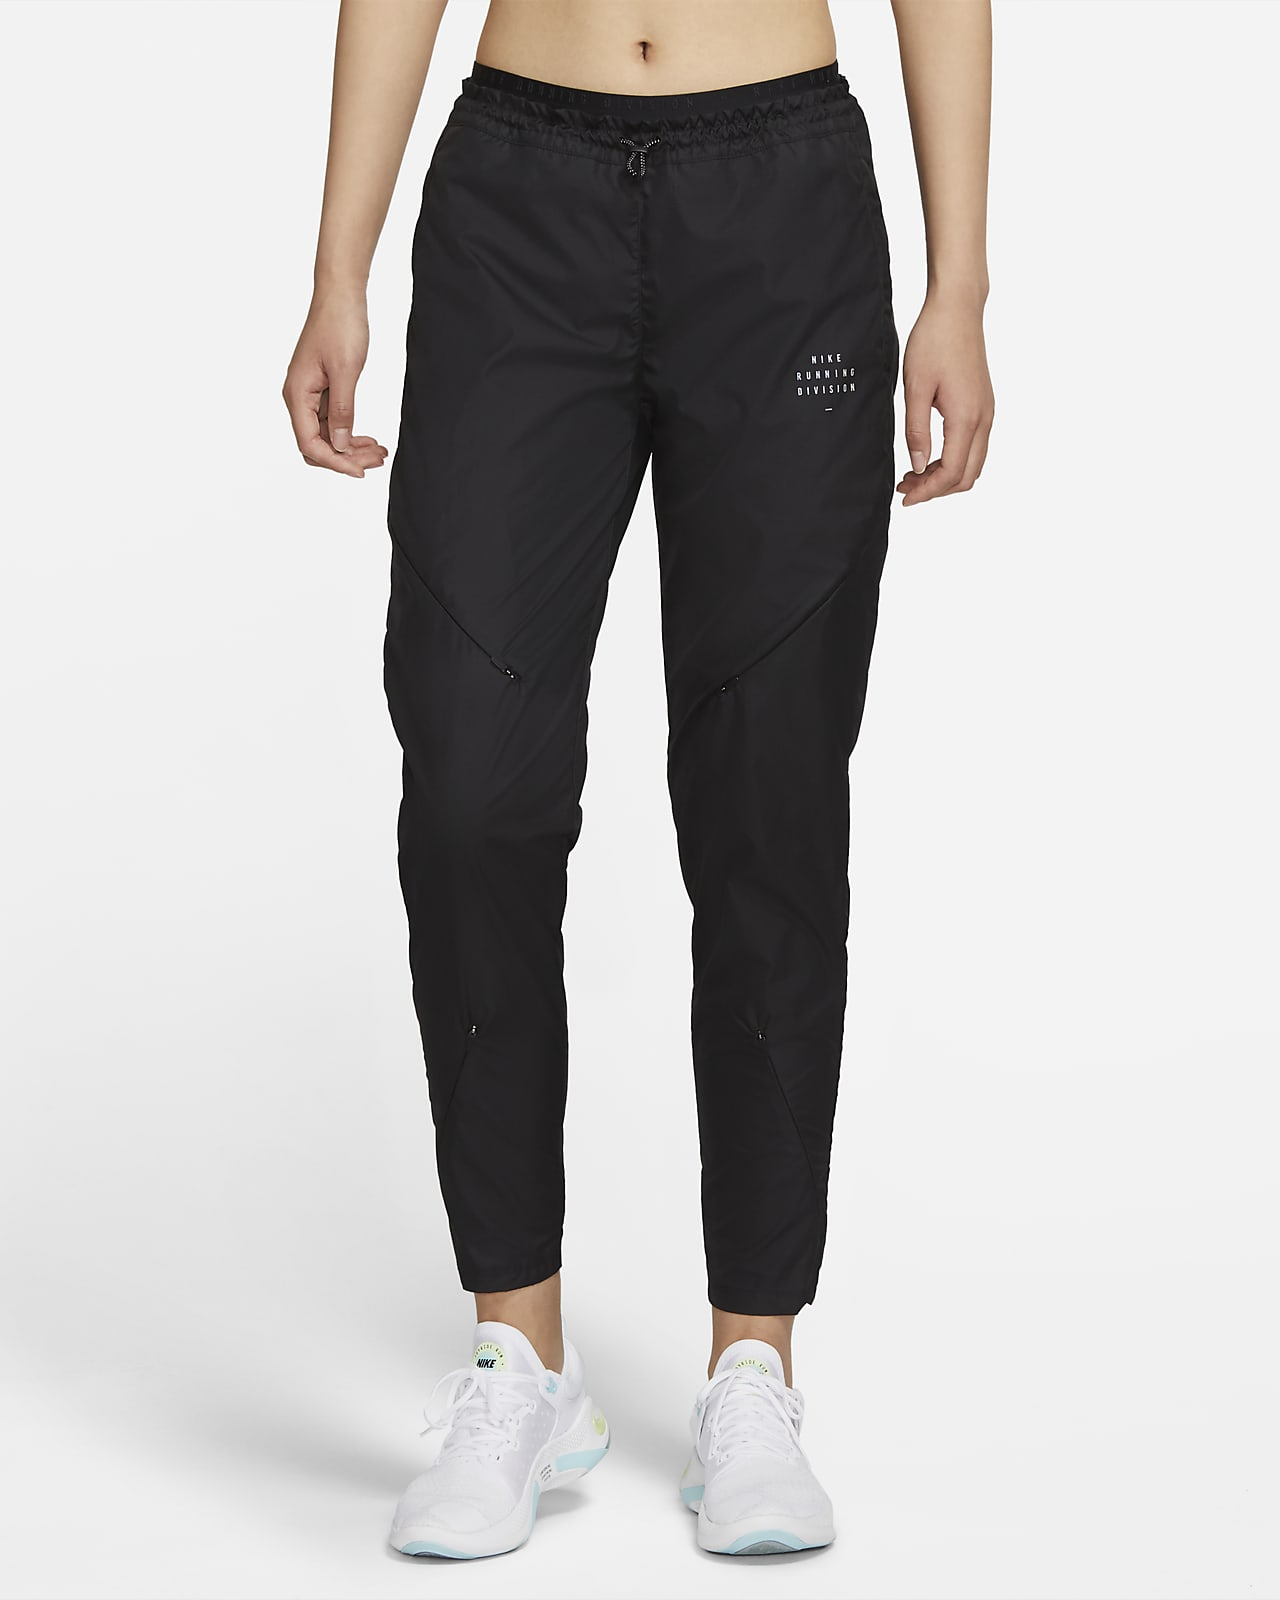 Nike Run Division Women's Dynamic Vent Running Trousers